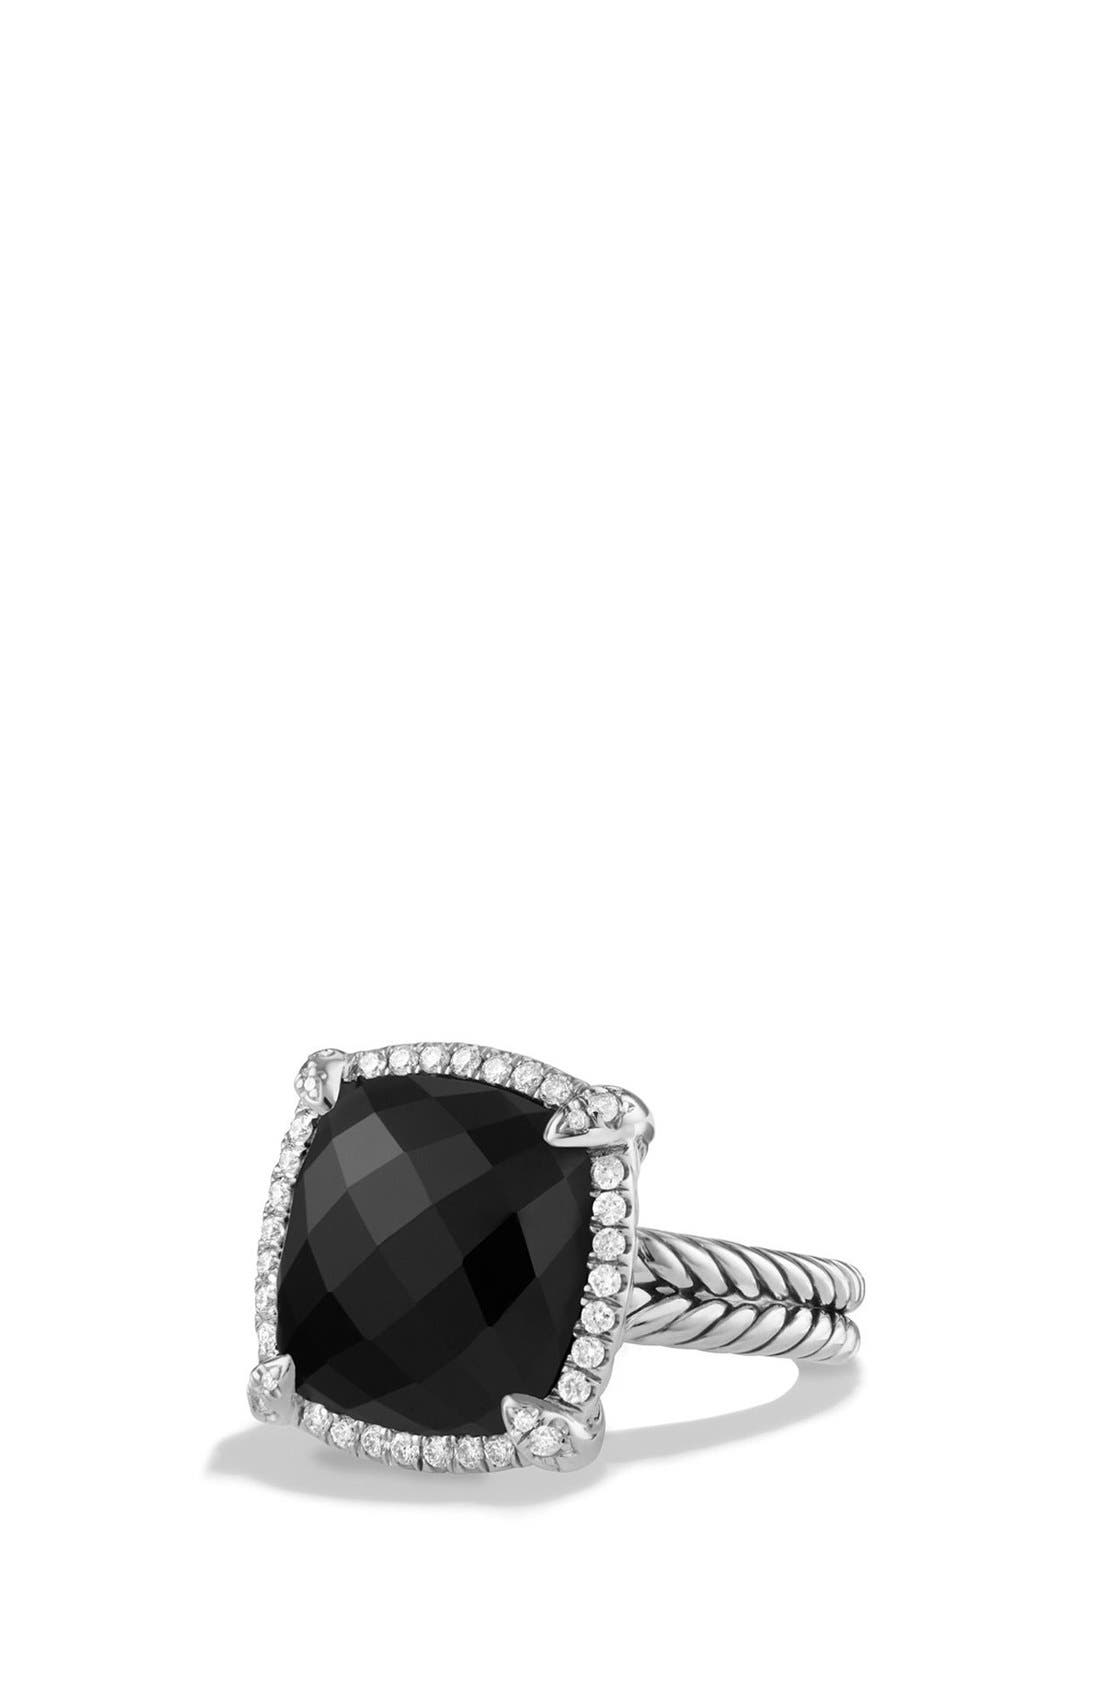 'Châtelaine' Large Pavé Bezel Ring with Diamonds,                         Main,                         color, Black Onyx